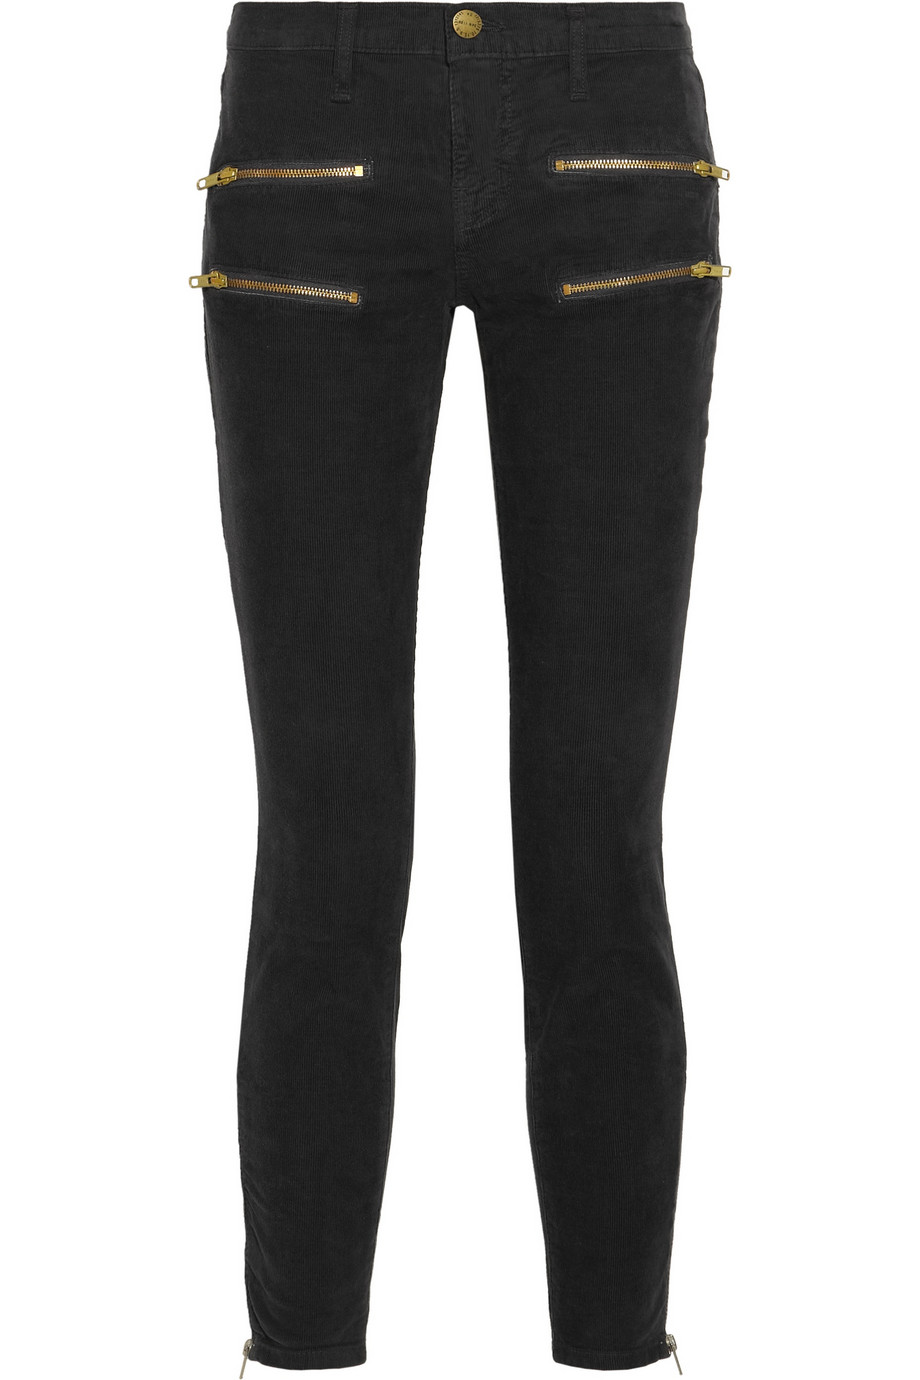 Zip Skinny Jeans - Jeans Am